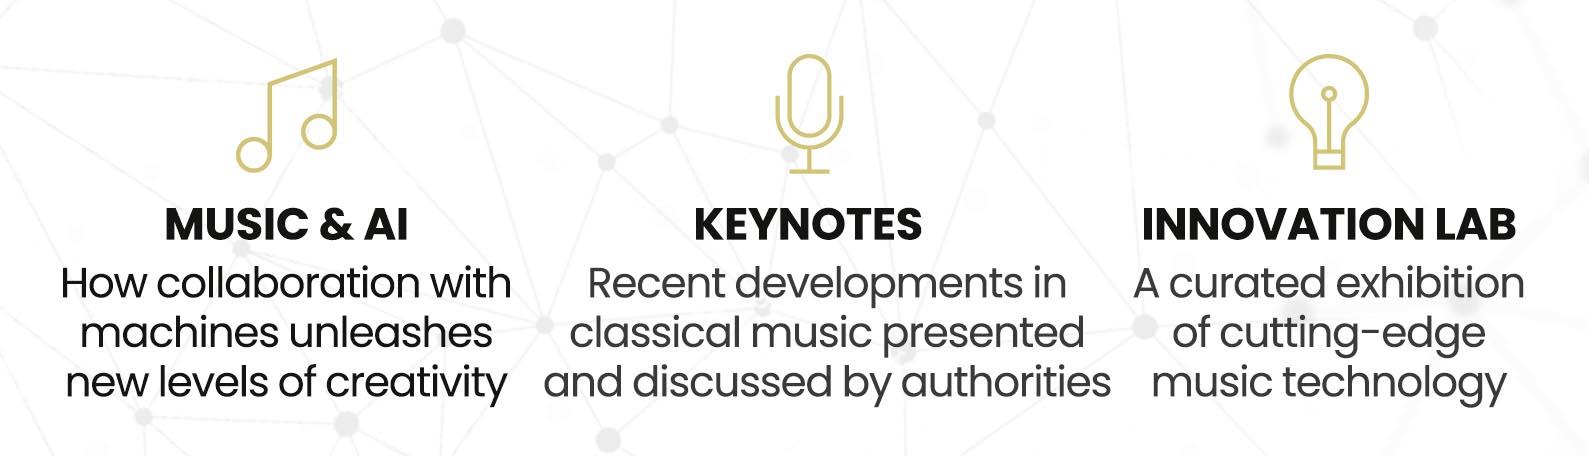 Karajan Music Tech Features 2019